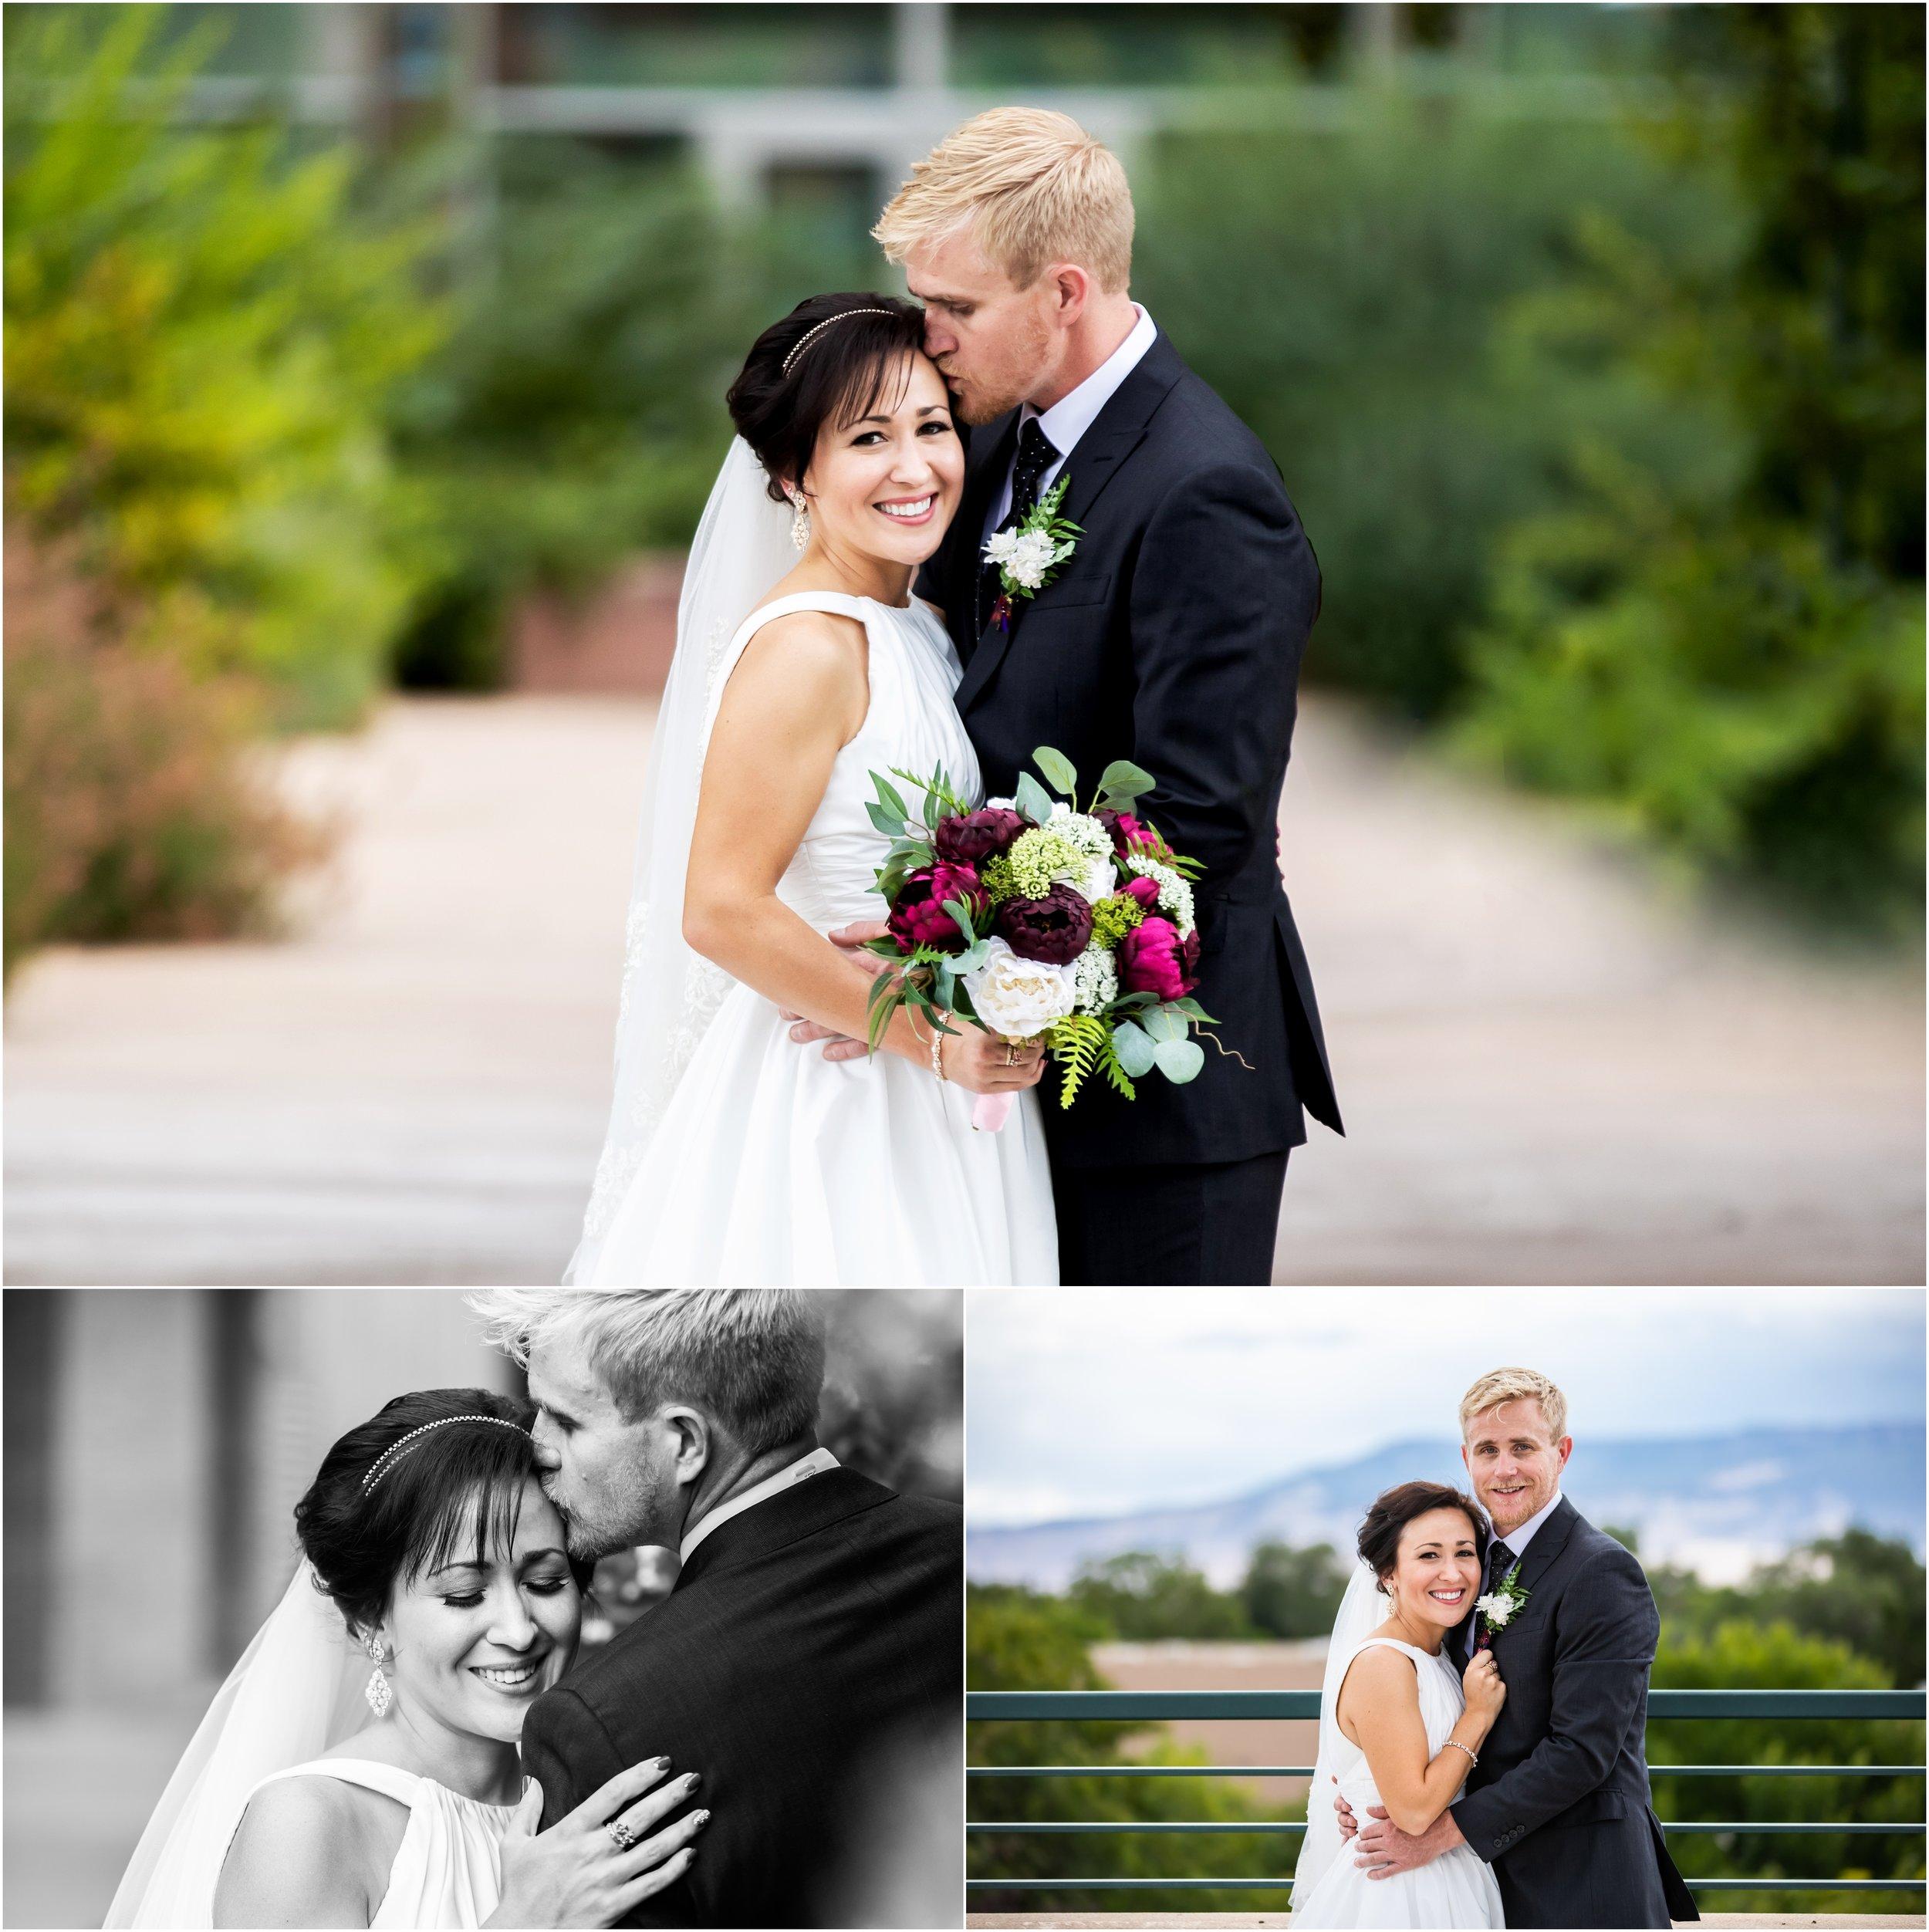 grand junction wedding photographer 19.jpg